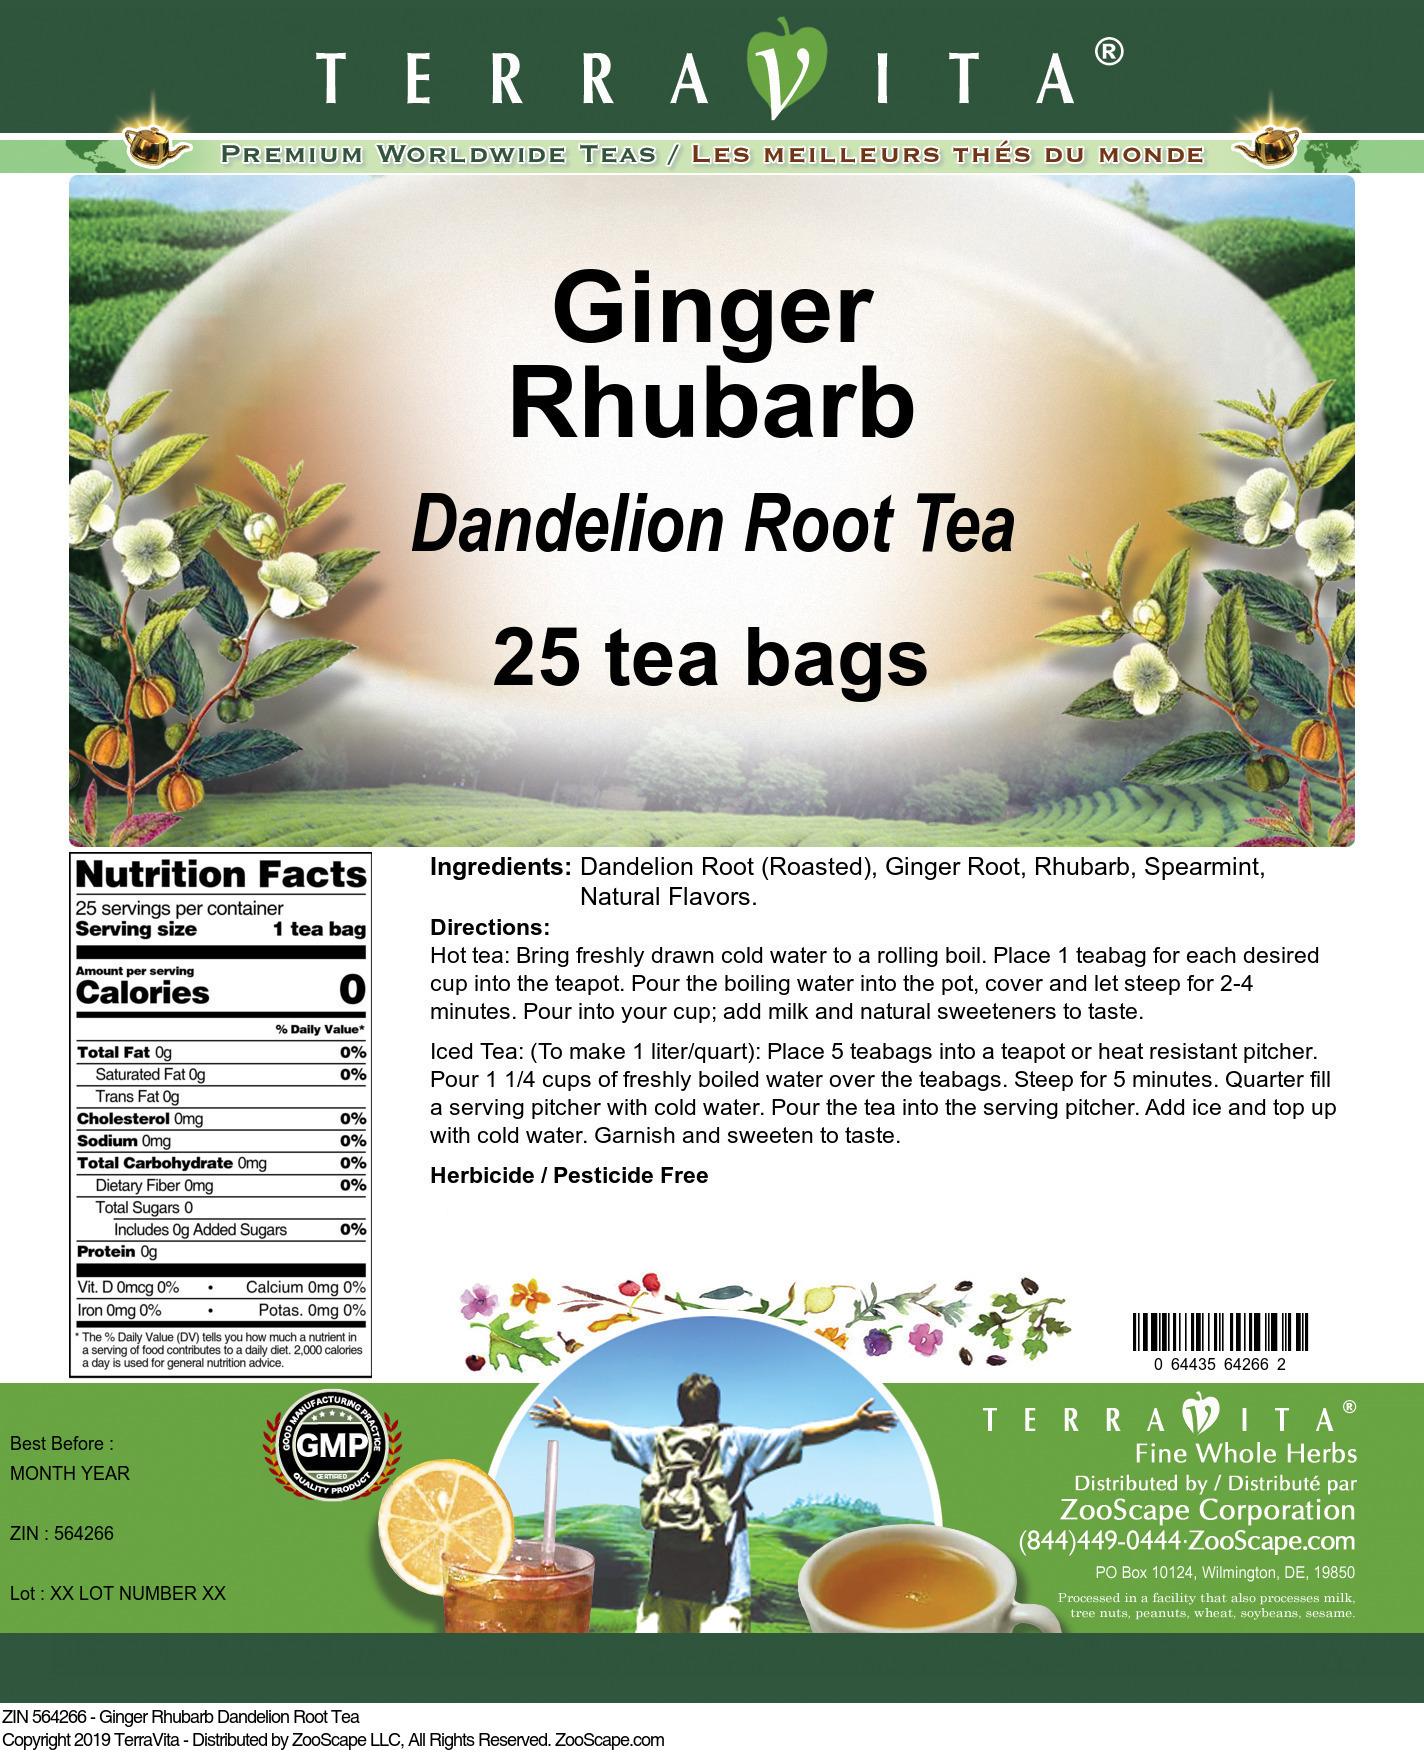 Ginger Rhubarb Dandelion Root Tea